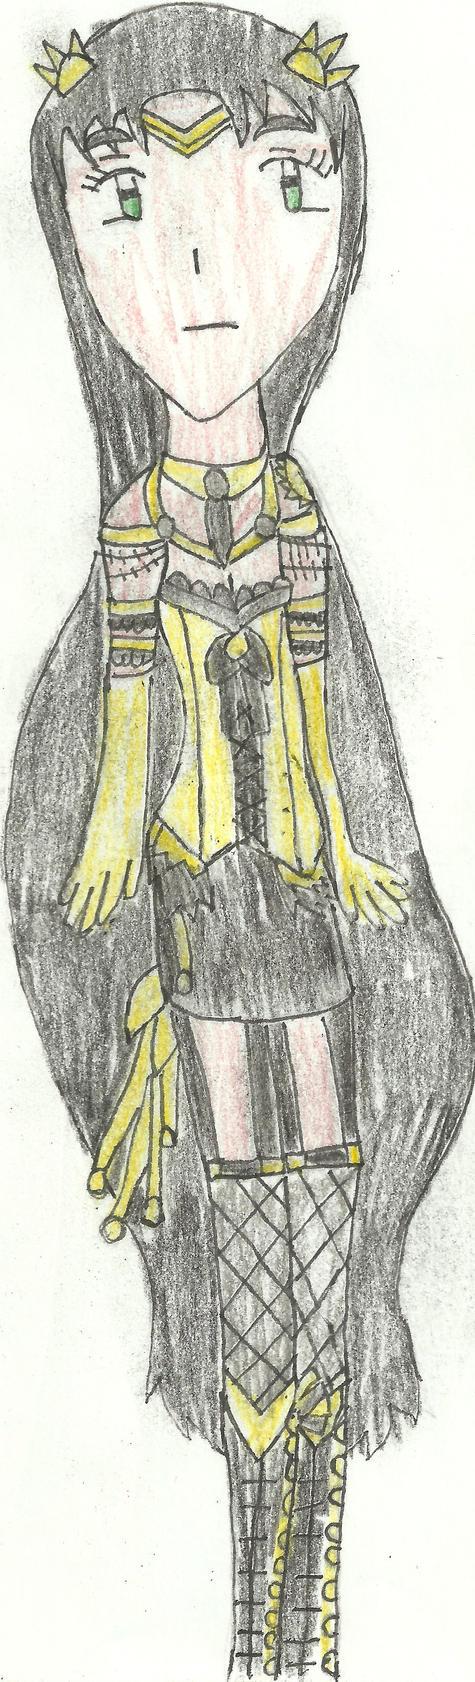 Art Trade: SailorSunPhoenix by Nemesis12